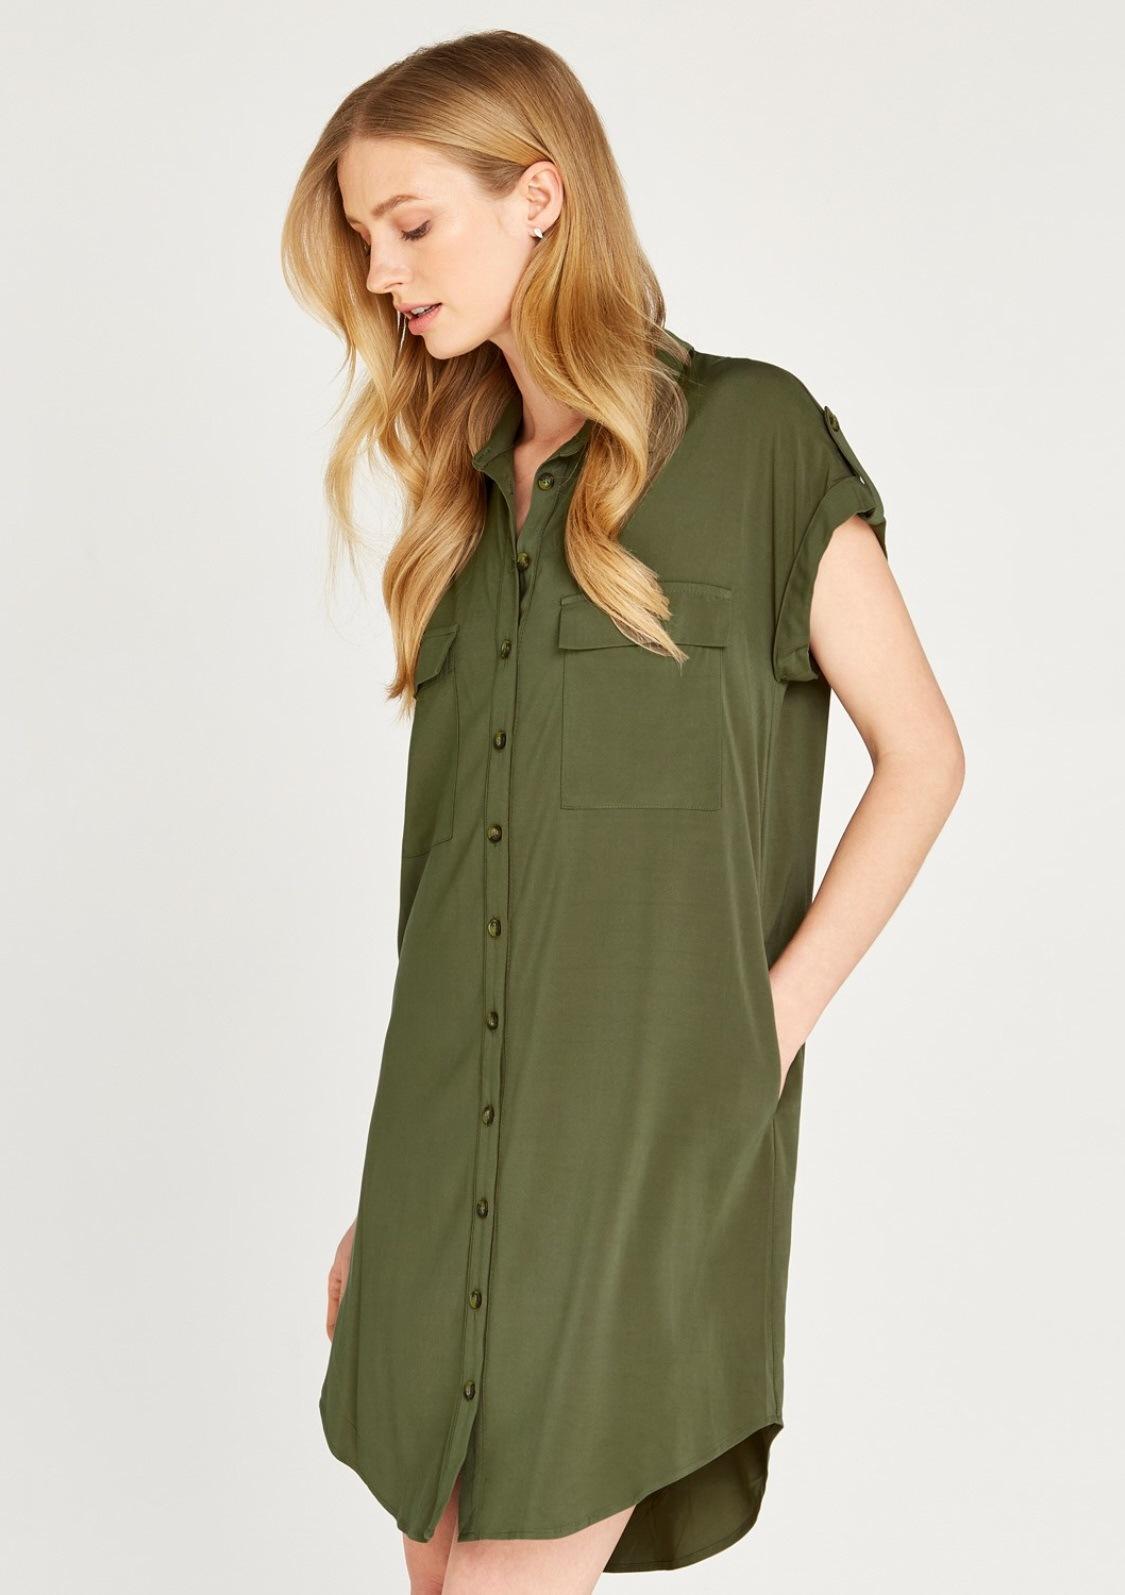 Image of Apricot Hemdblusenkleid »Sleeveless Utility Shirt Dress«